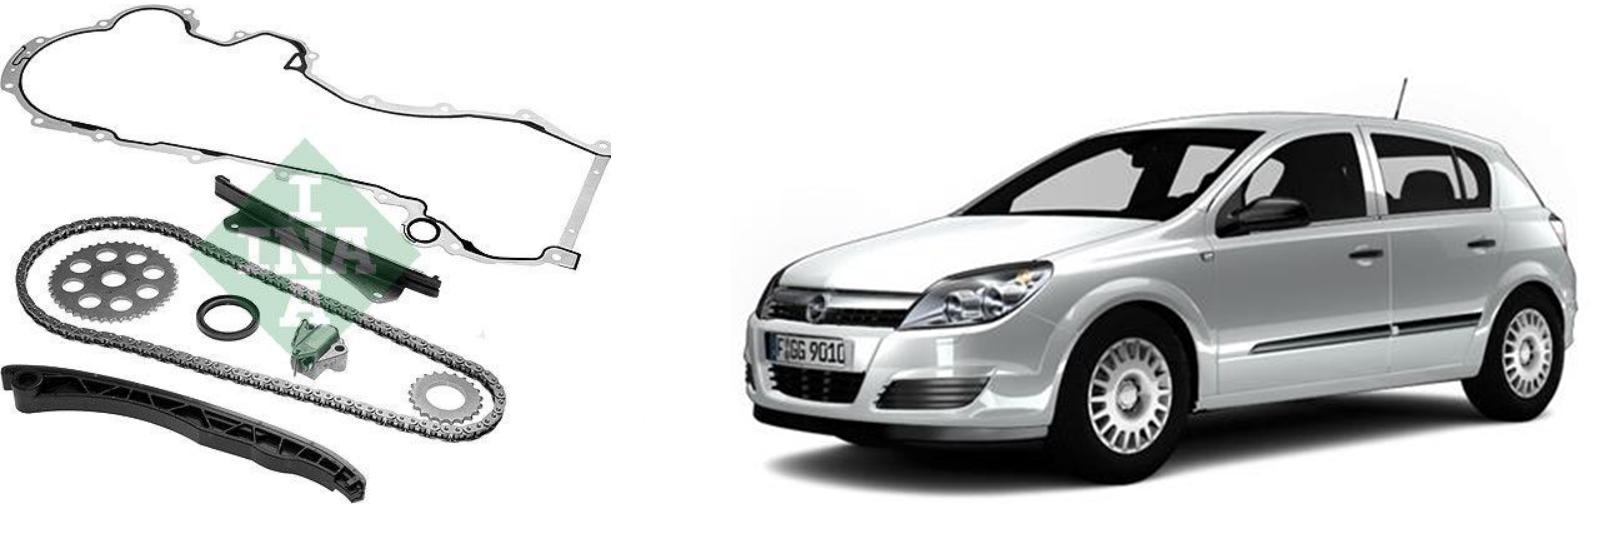 Kit catena distribuzione 1.3 CDTI per Opel Astra H